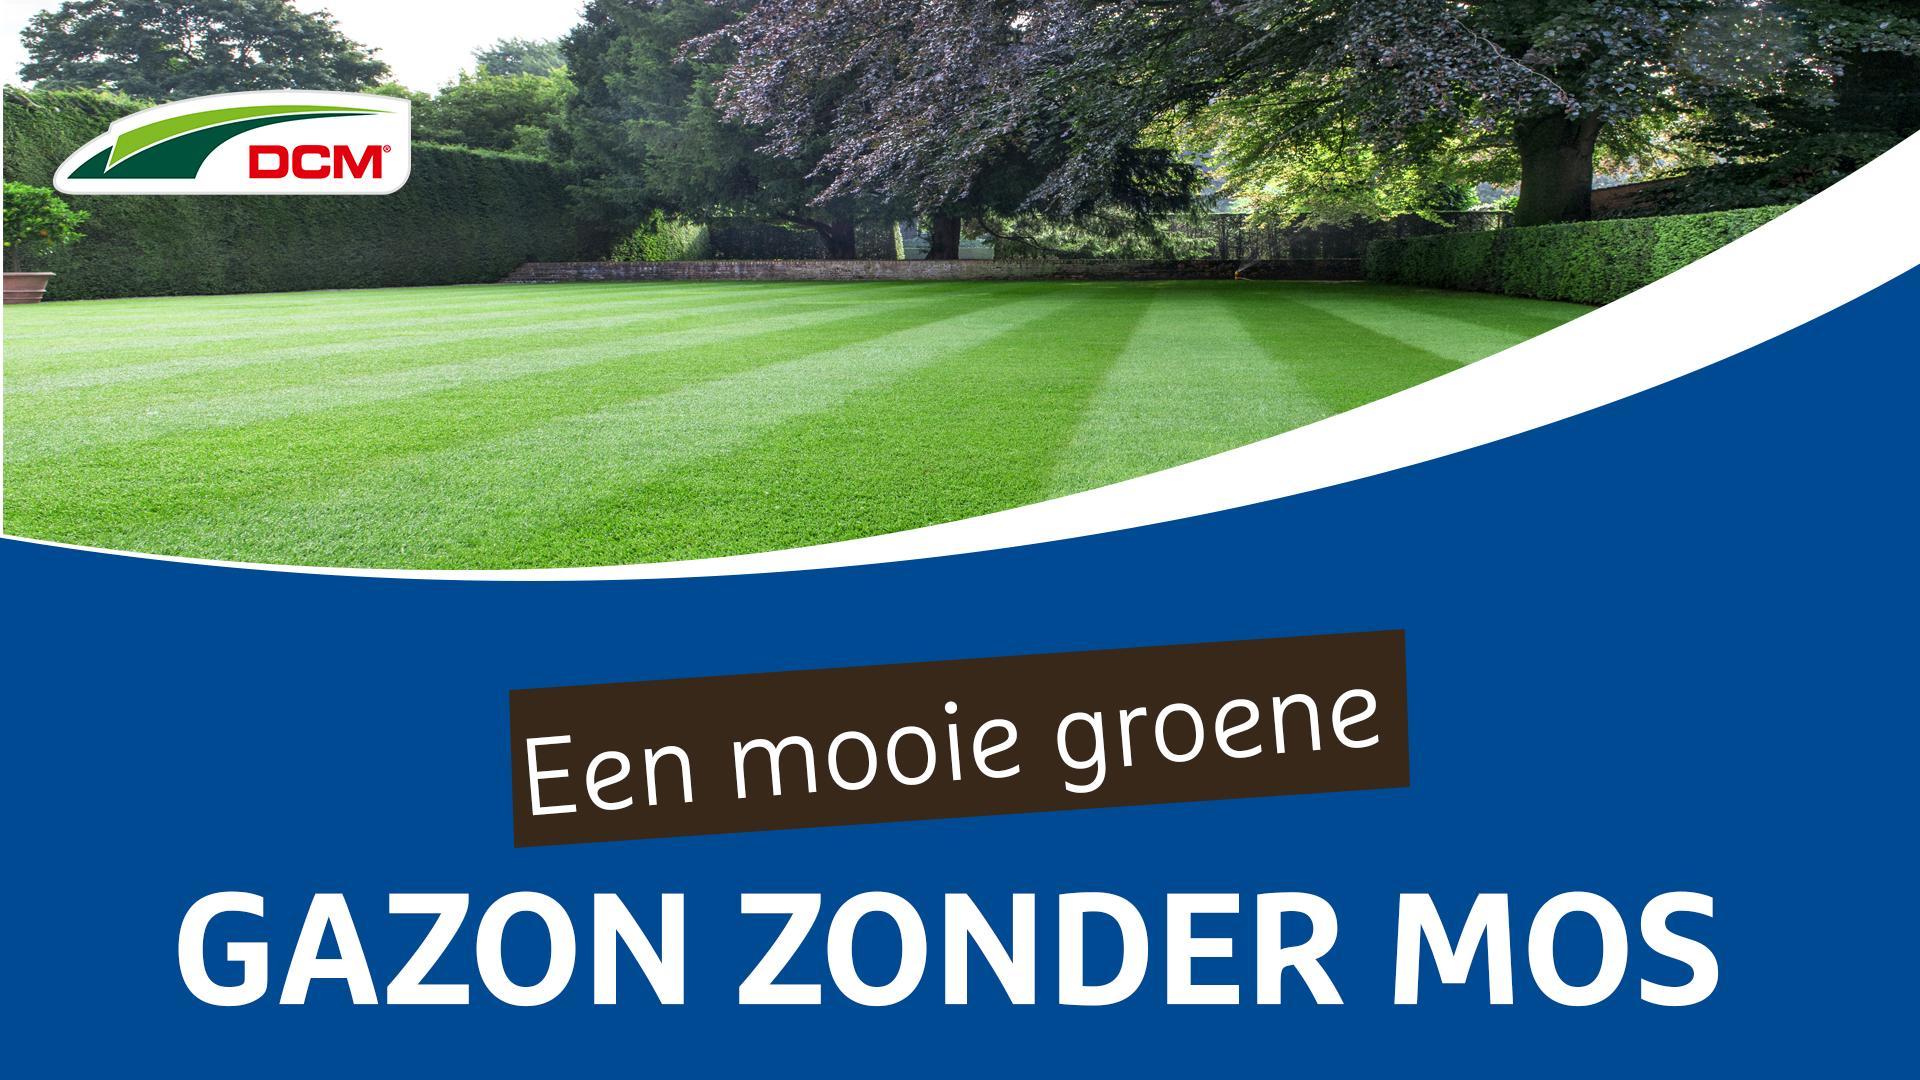 Een mooi groene gazon zonder mos - DCM Gazon Pur®